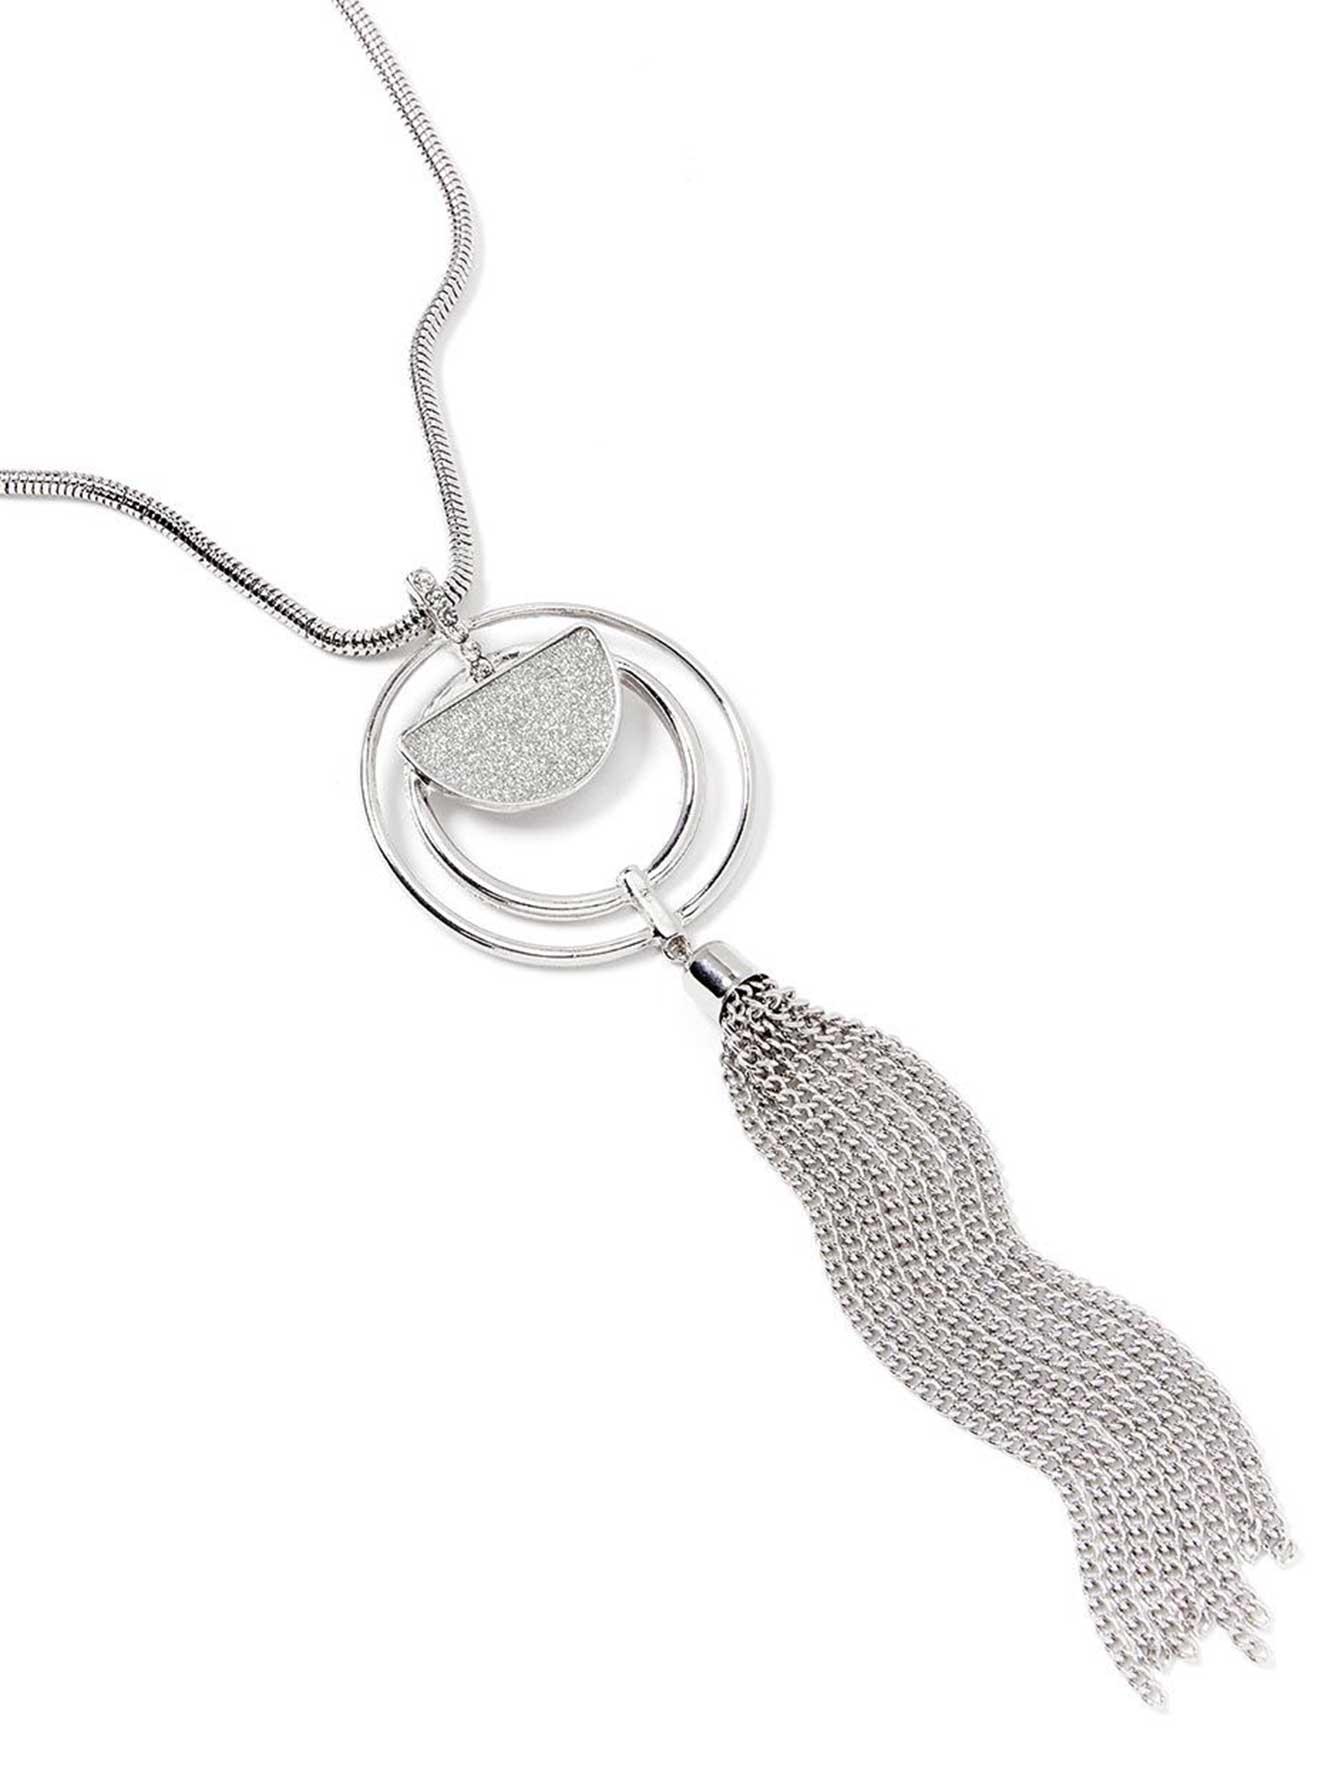 cf5e95c49ba Short Necklace with Pendant and Tassel | Penningtons